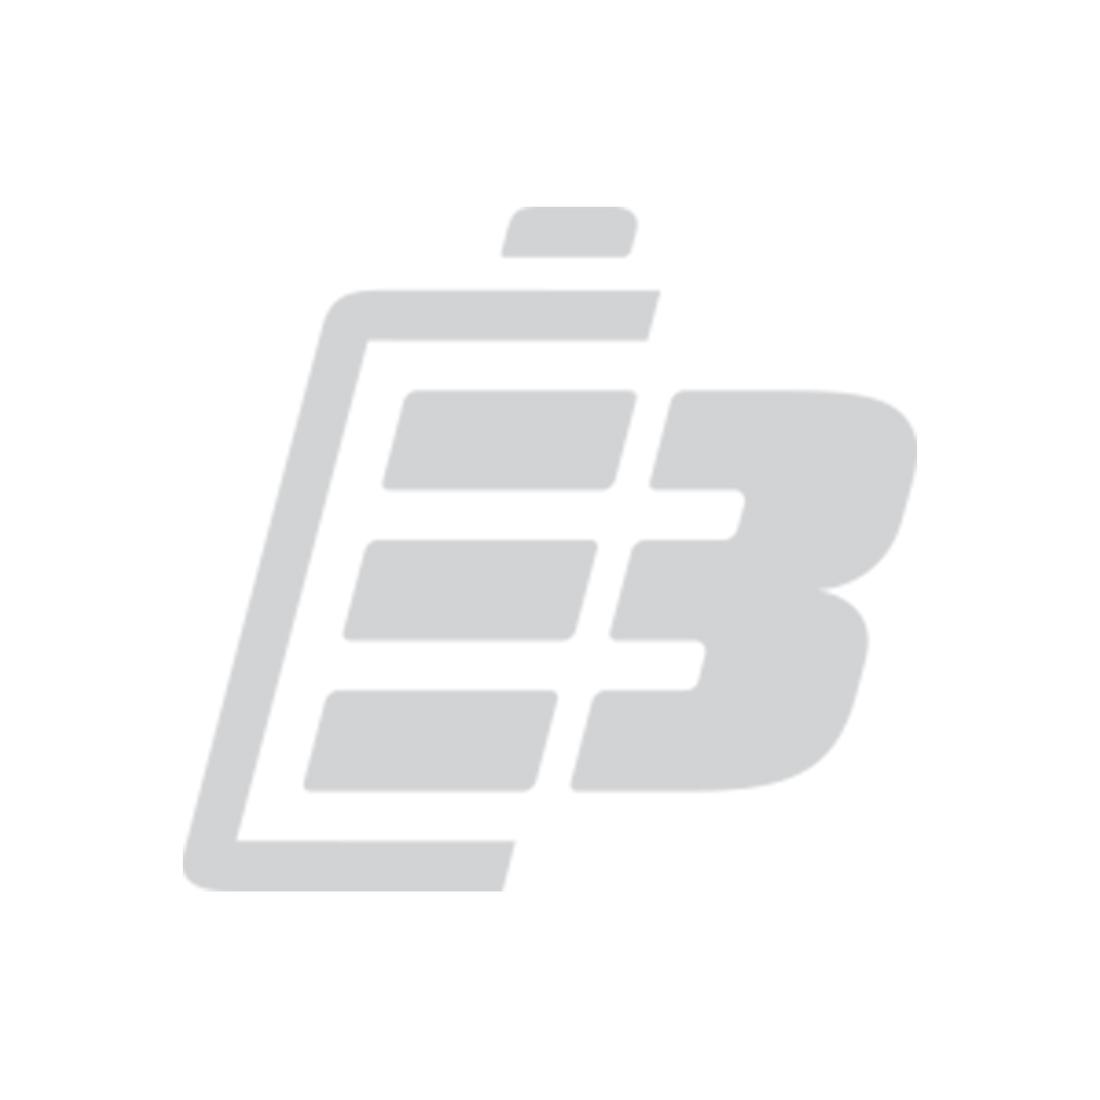 Smartphone battery Blackberry Torch 9800_1